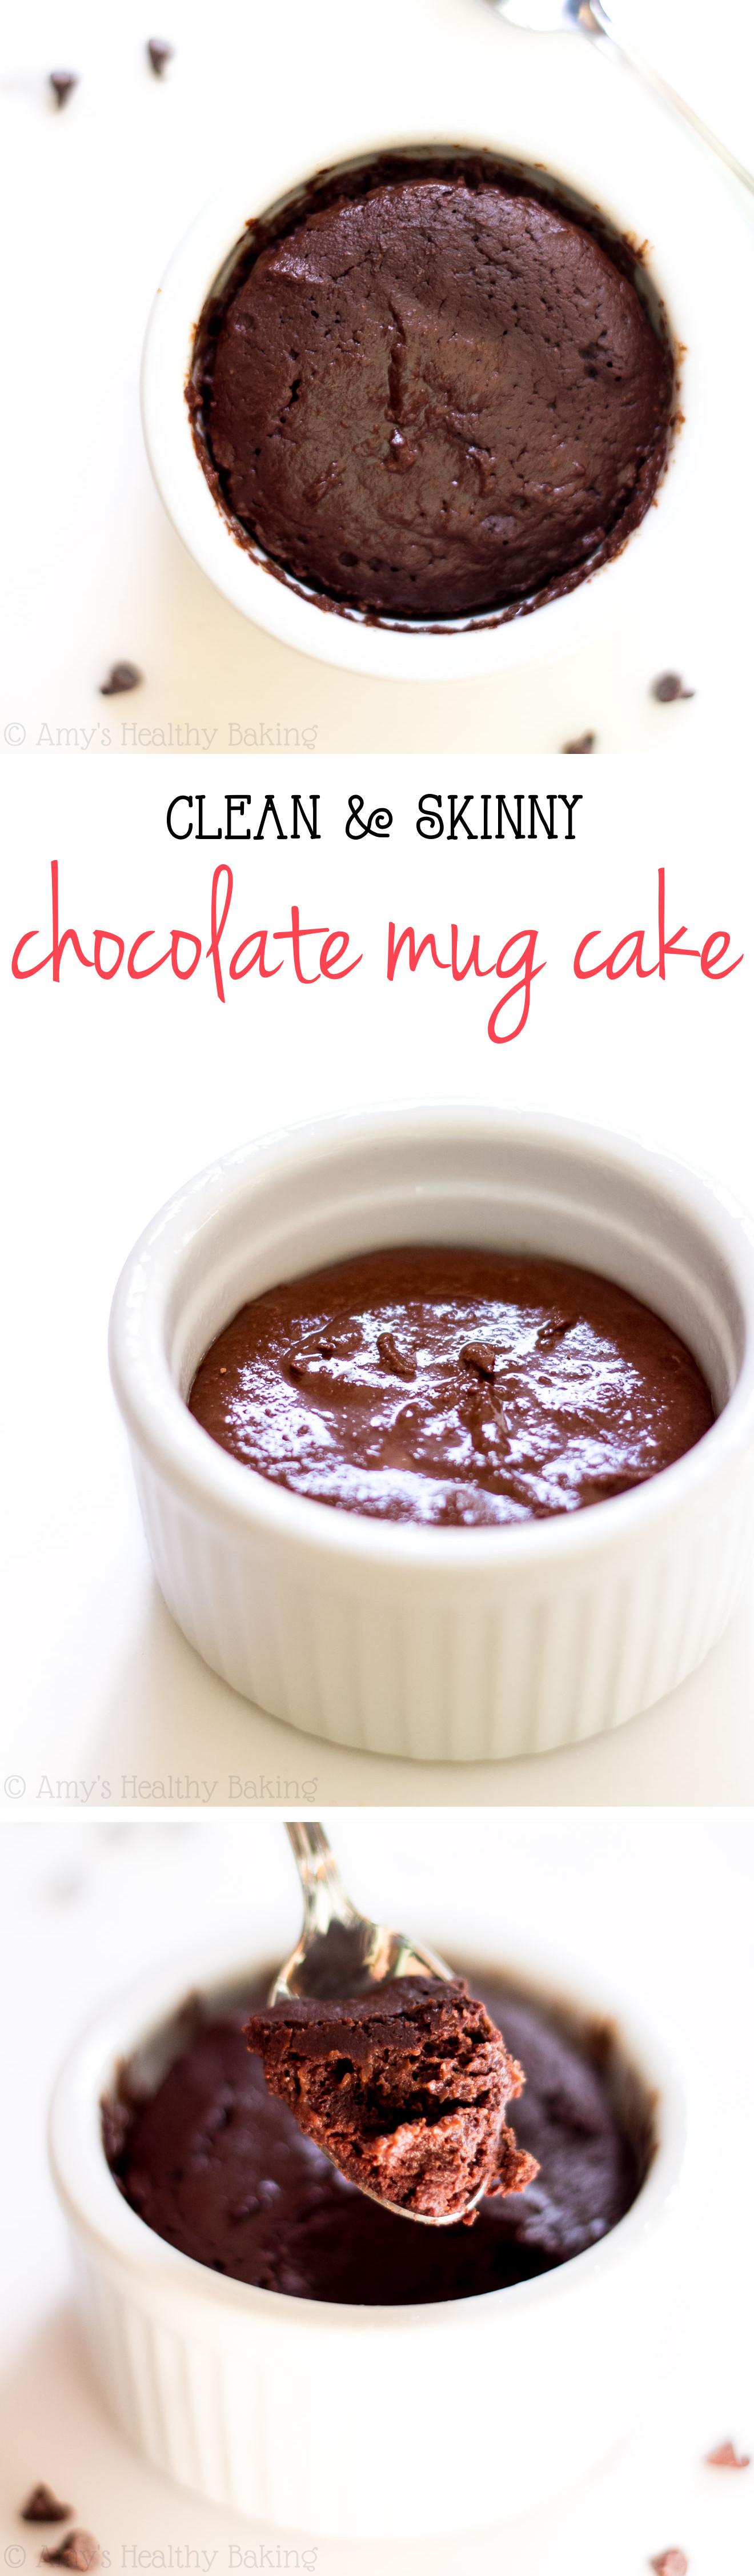 How To Make A Mug Cake  Single Serving Clean Chocolate Mug Cake Recipe Video